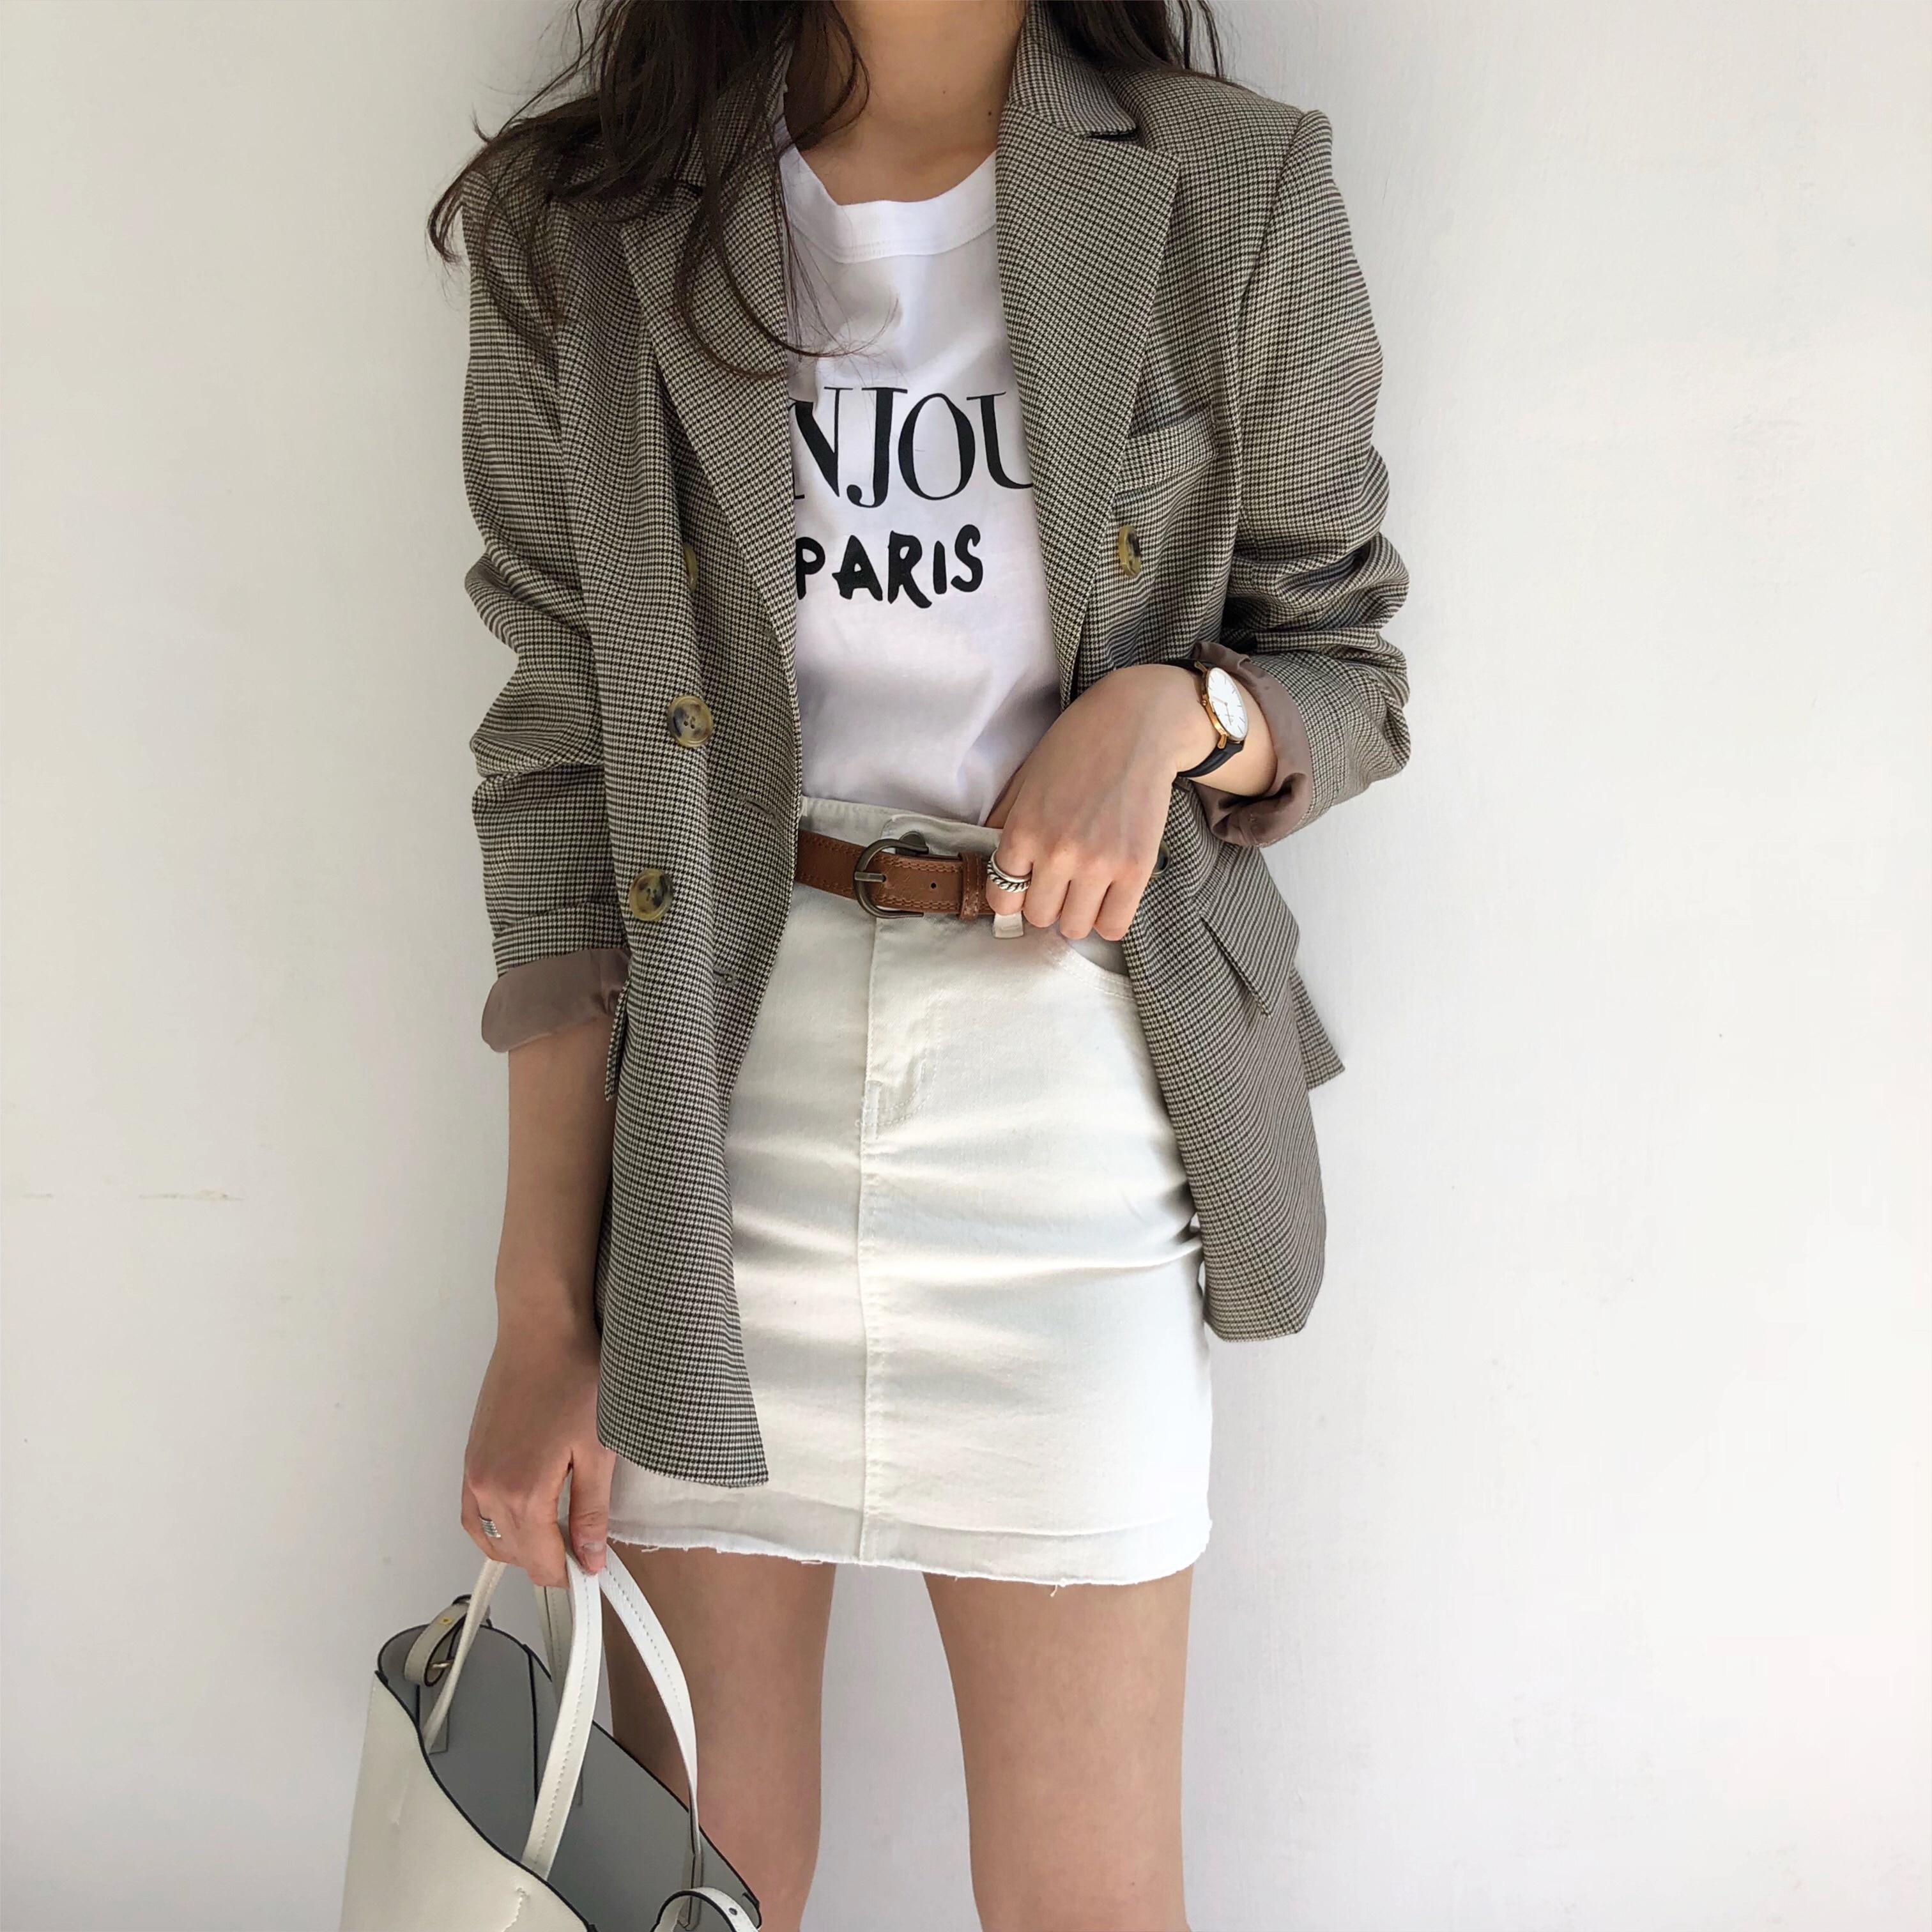 HziriP Office Blazer Women 2019 New Fashion Classic Plaid Double Breasted Jacket Notched Collar Female Suit Coat Blazer Feminino